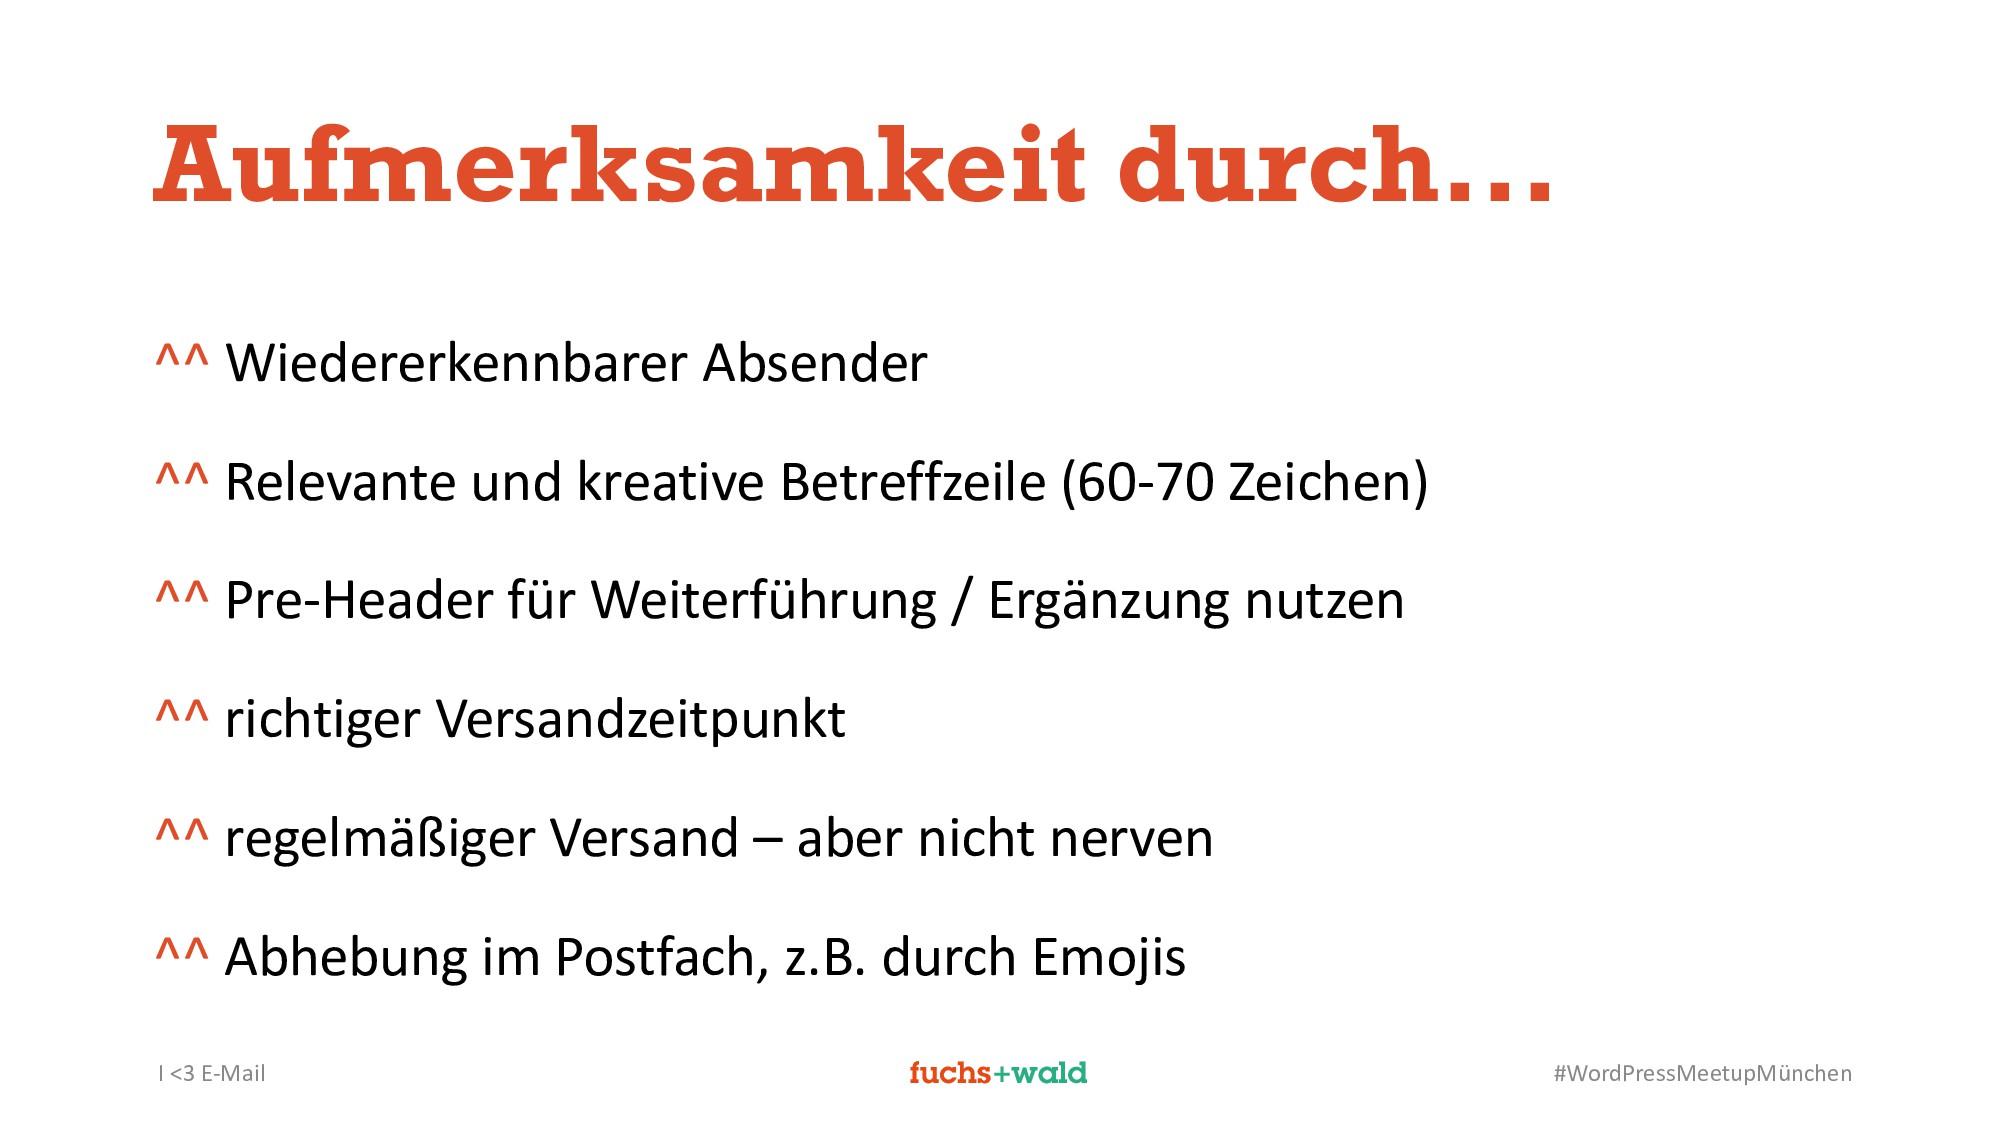 I <3 E-Mail #WordPressMeetupMünchen Aufmerksamk...